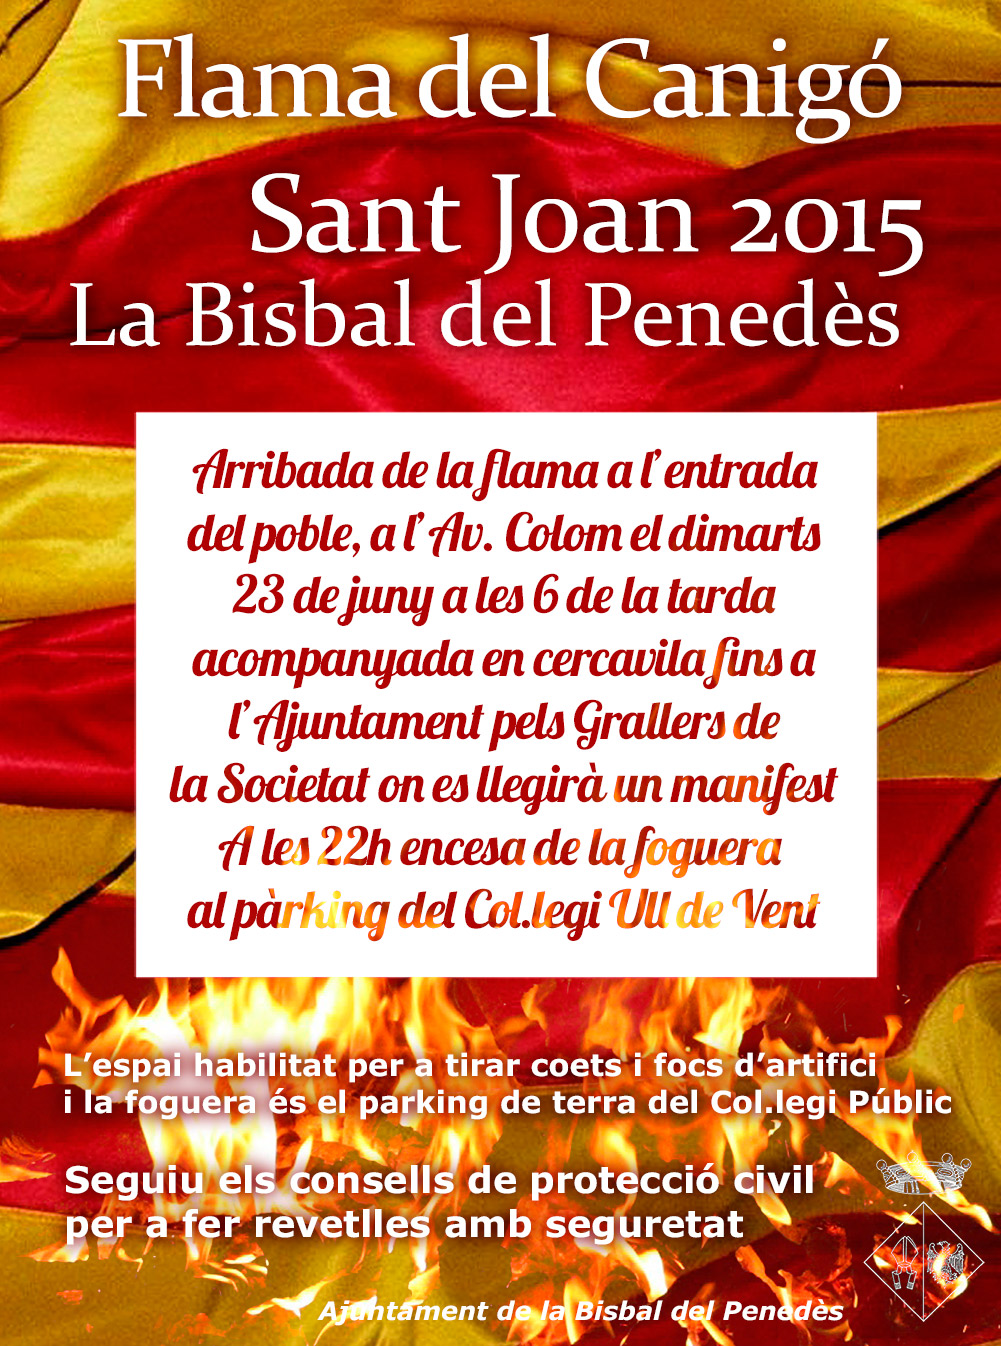 Ajuntament de la bisbal del pened s sant joan 2015 la - Tiempo la bisbal del penedes ...